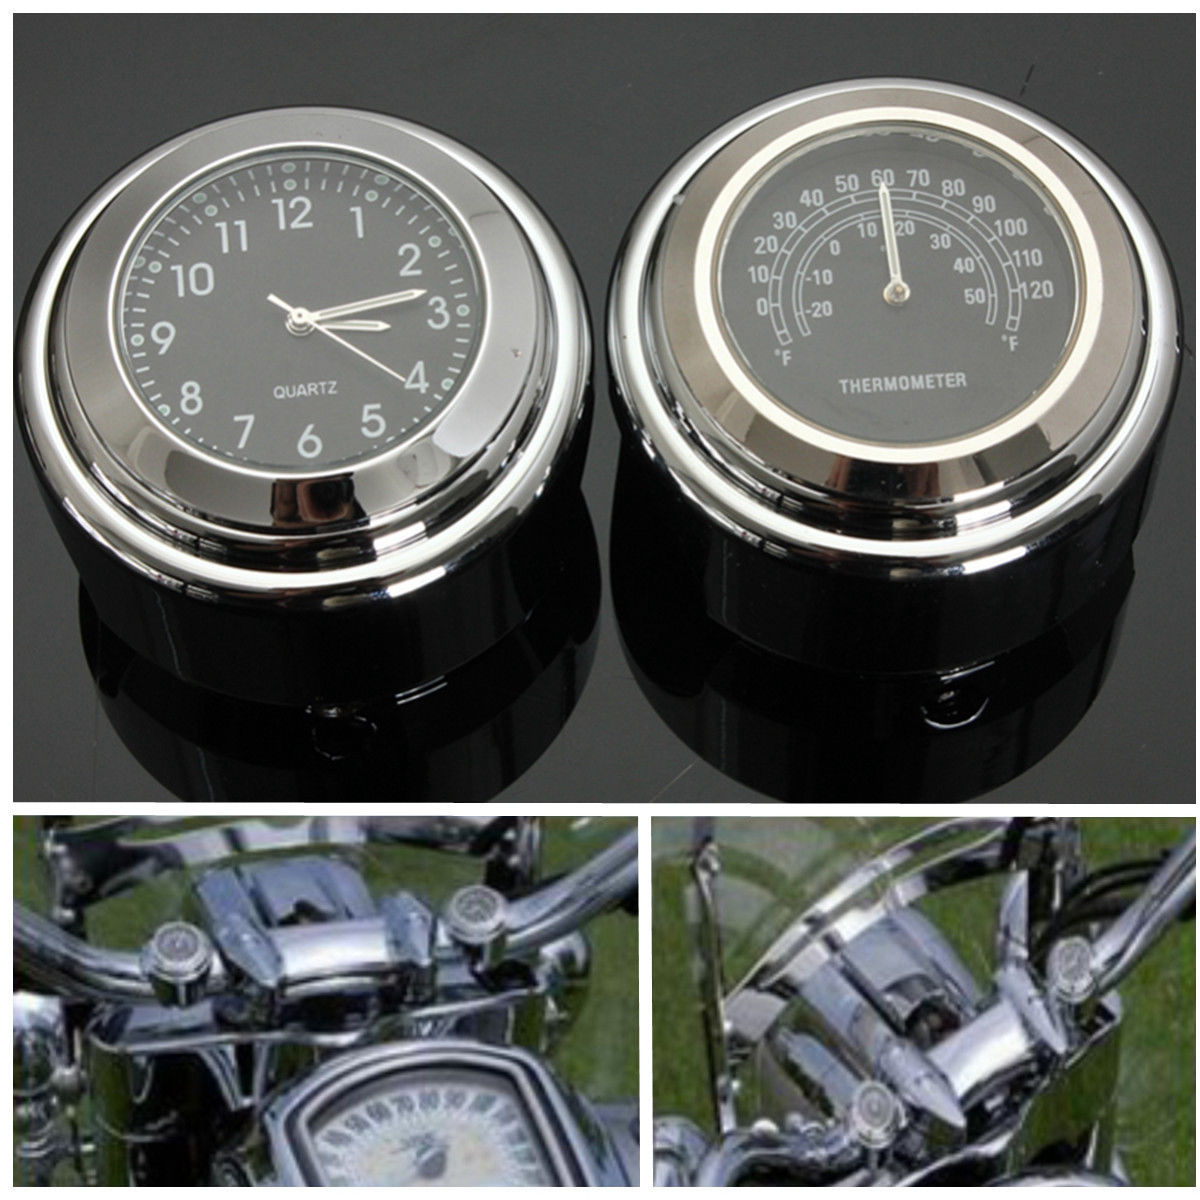 7/8 1 мотоцикл Велосипедное Крепление Циферблат часы термометр ТЕМП для Harley